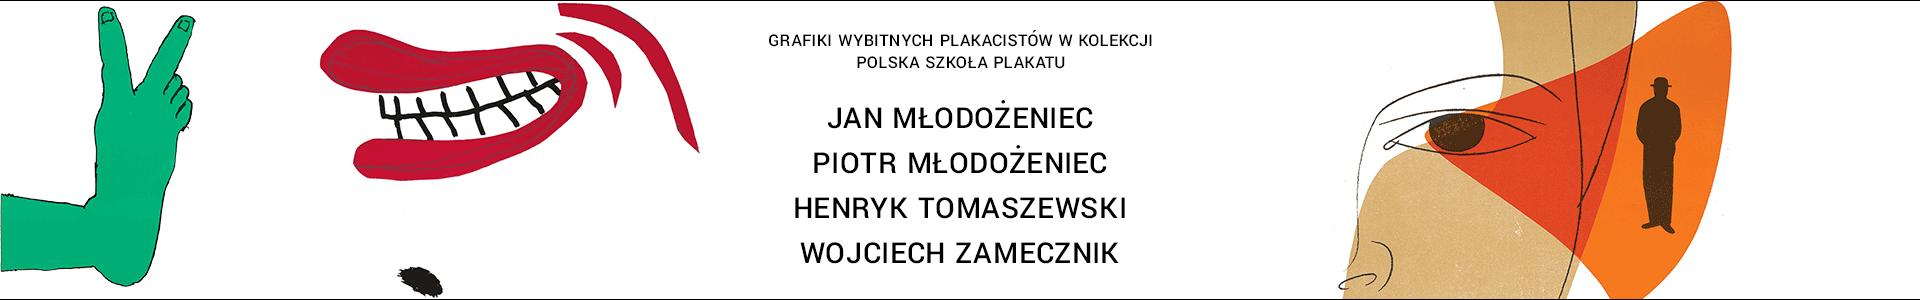 baner_Polska_Szkola_Plakatu_kt.png